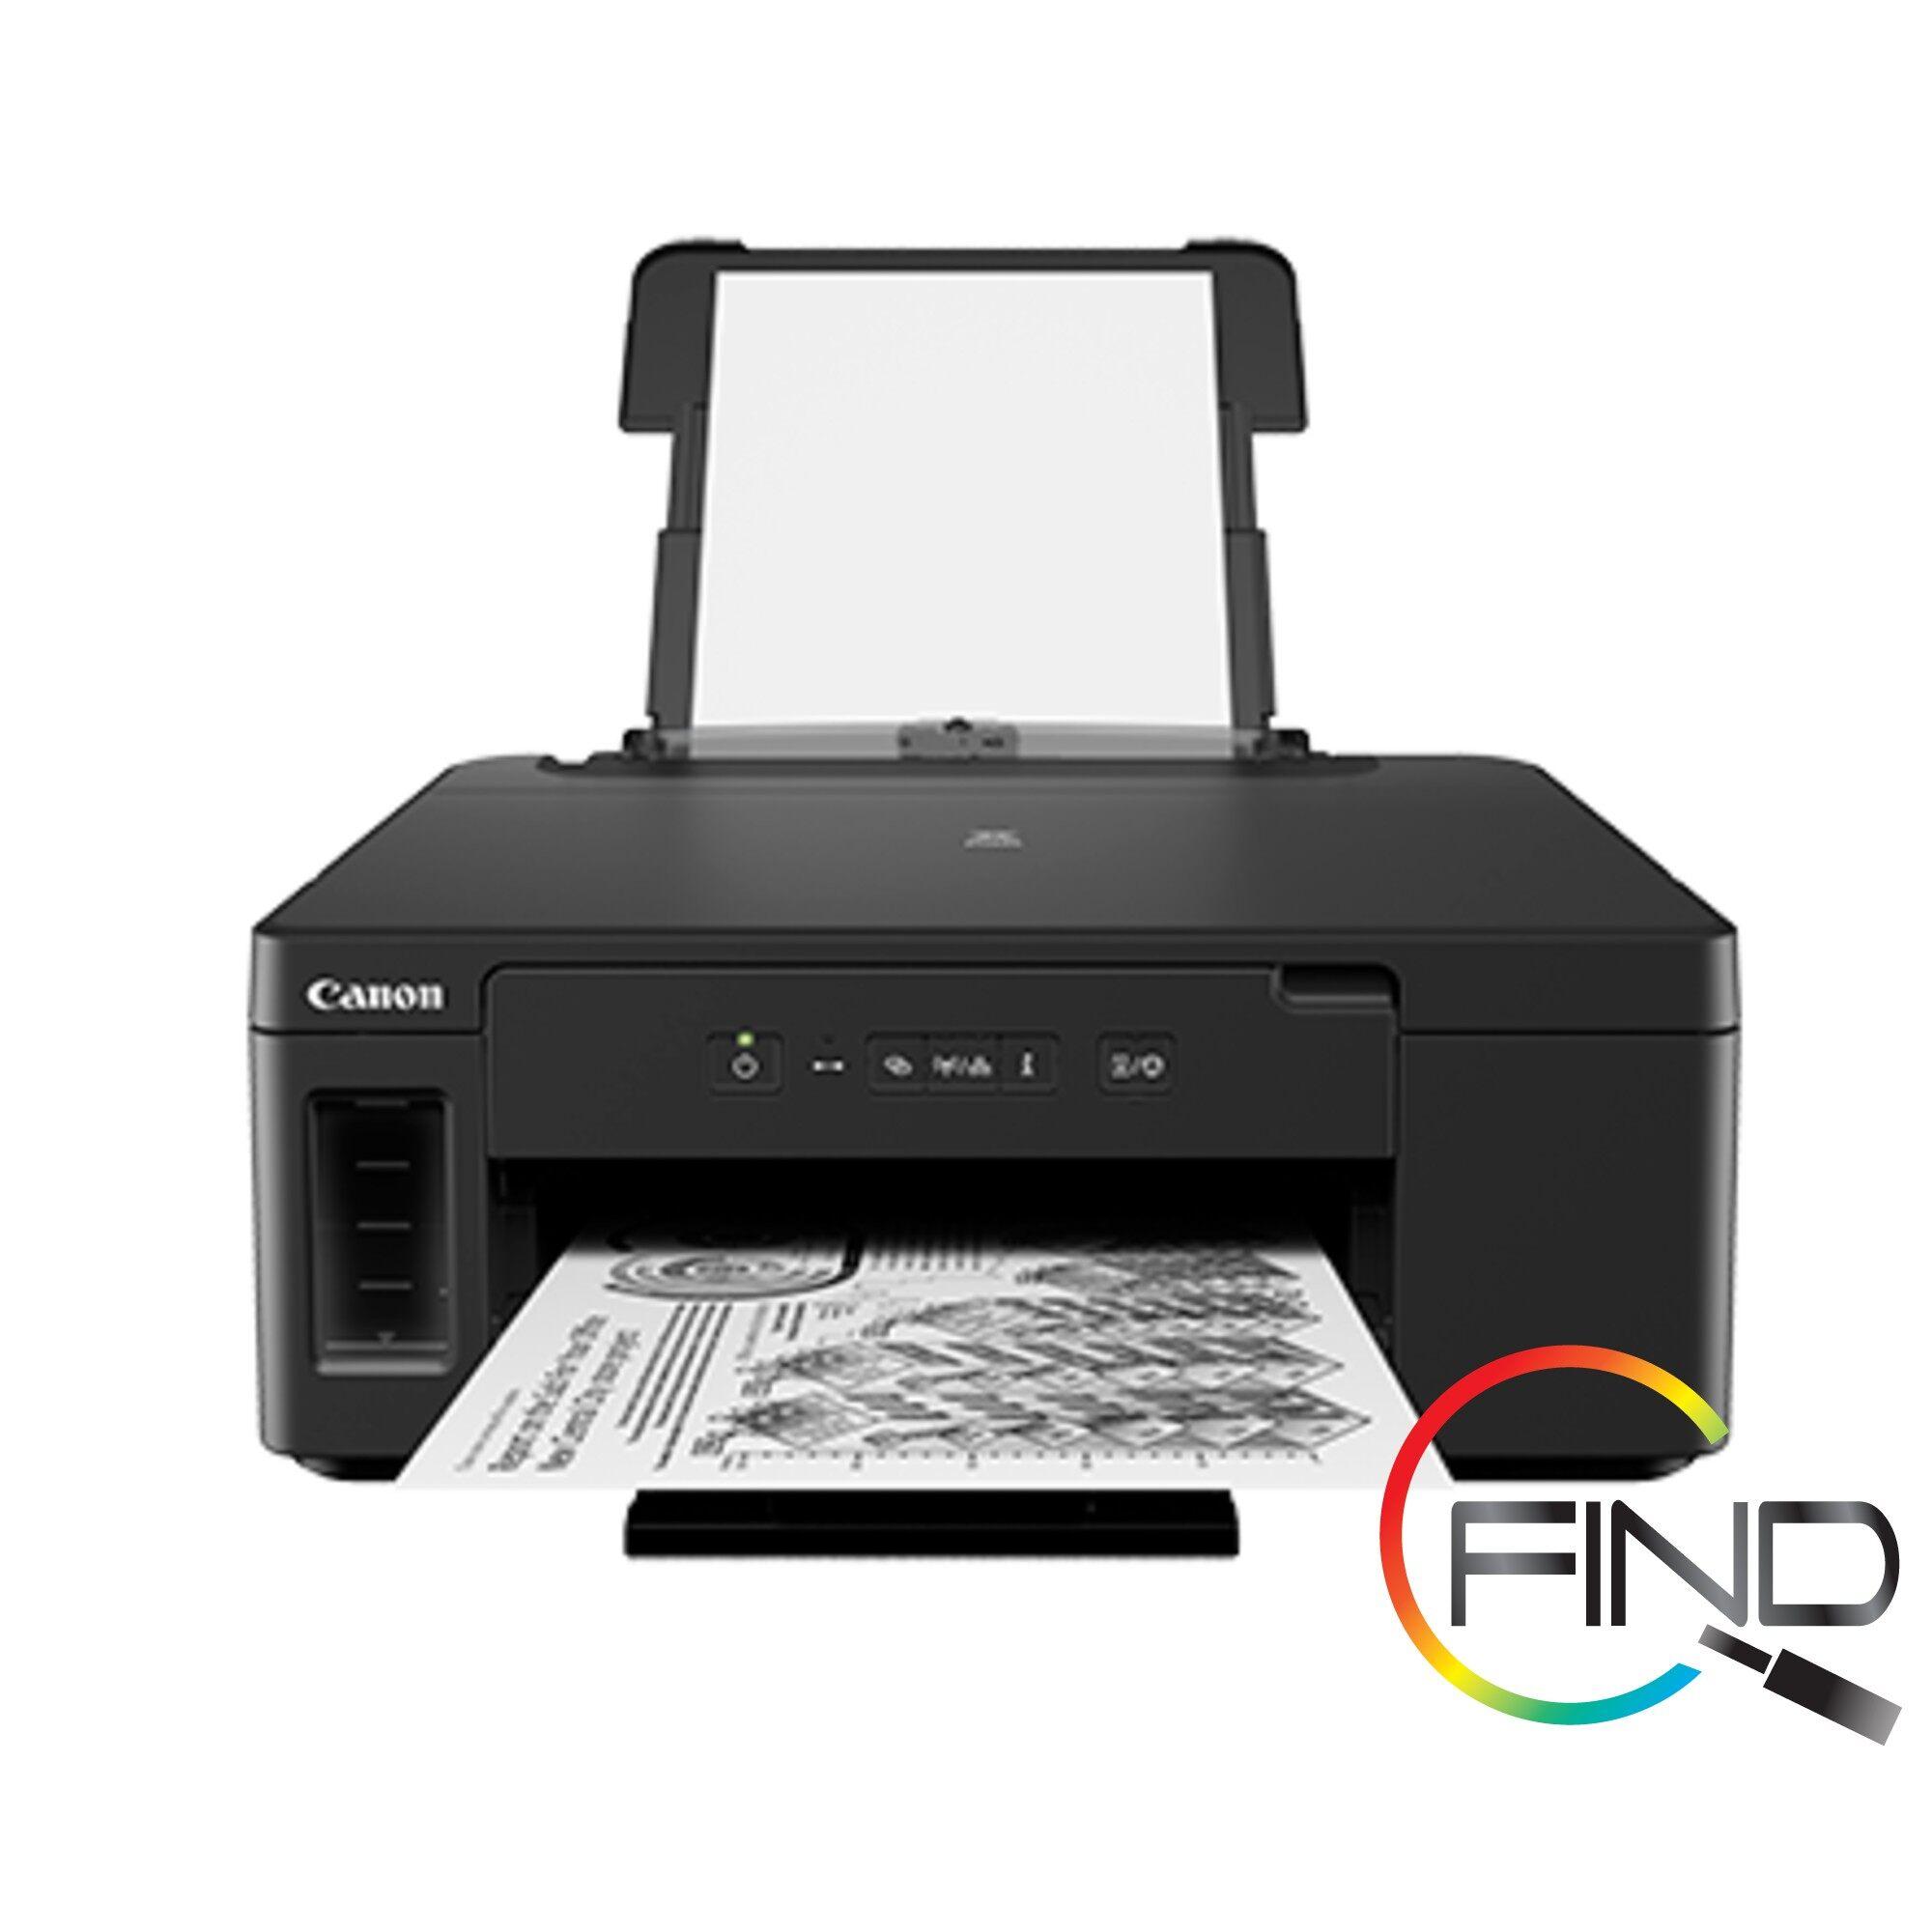 CANON PIXMA GM2070 PRINTER (REFILLABLE INK TANK Wireless Printer for High Volume Monochrome Printing)